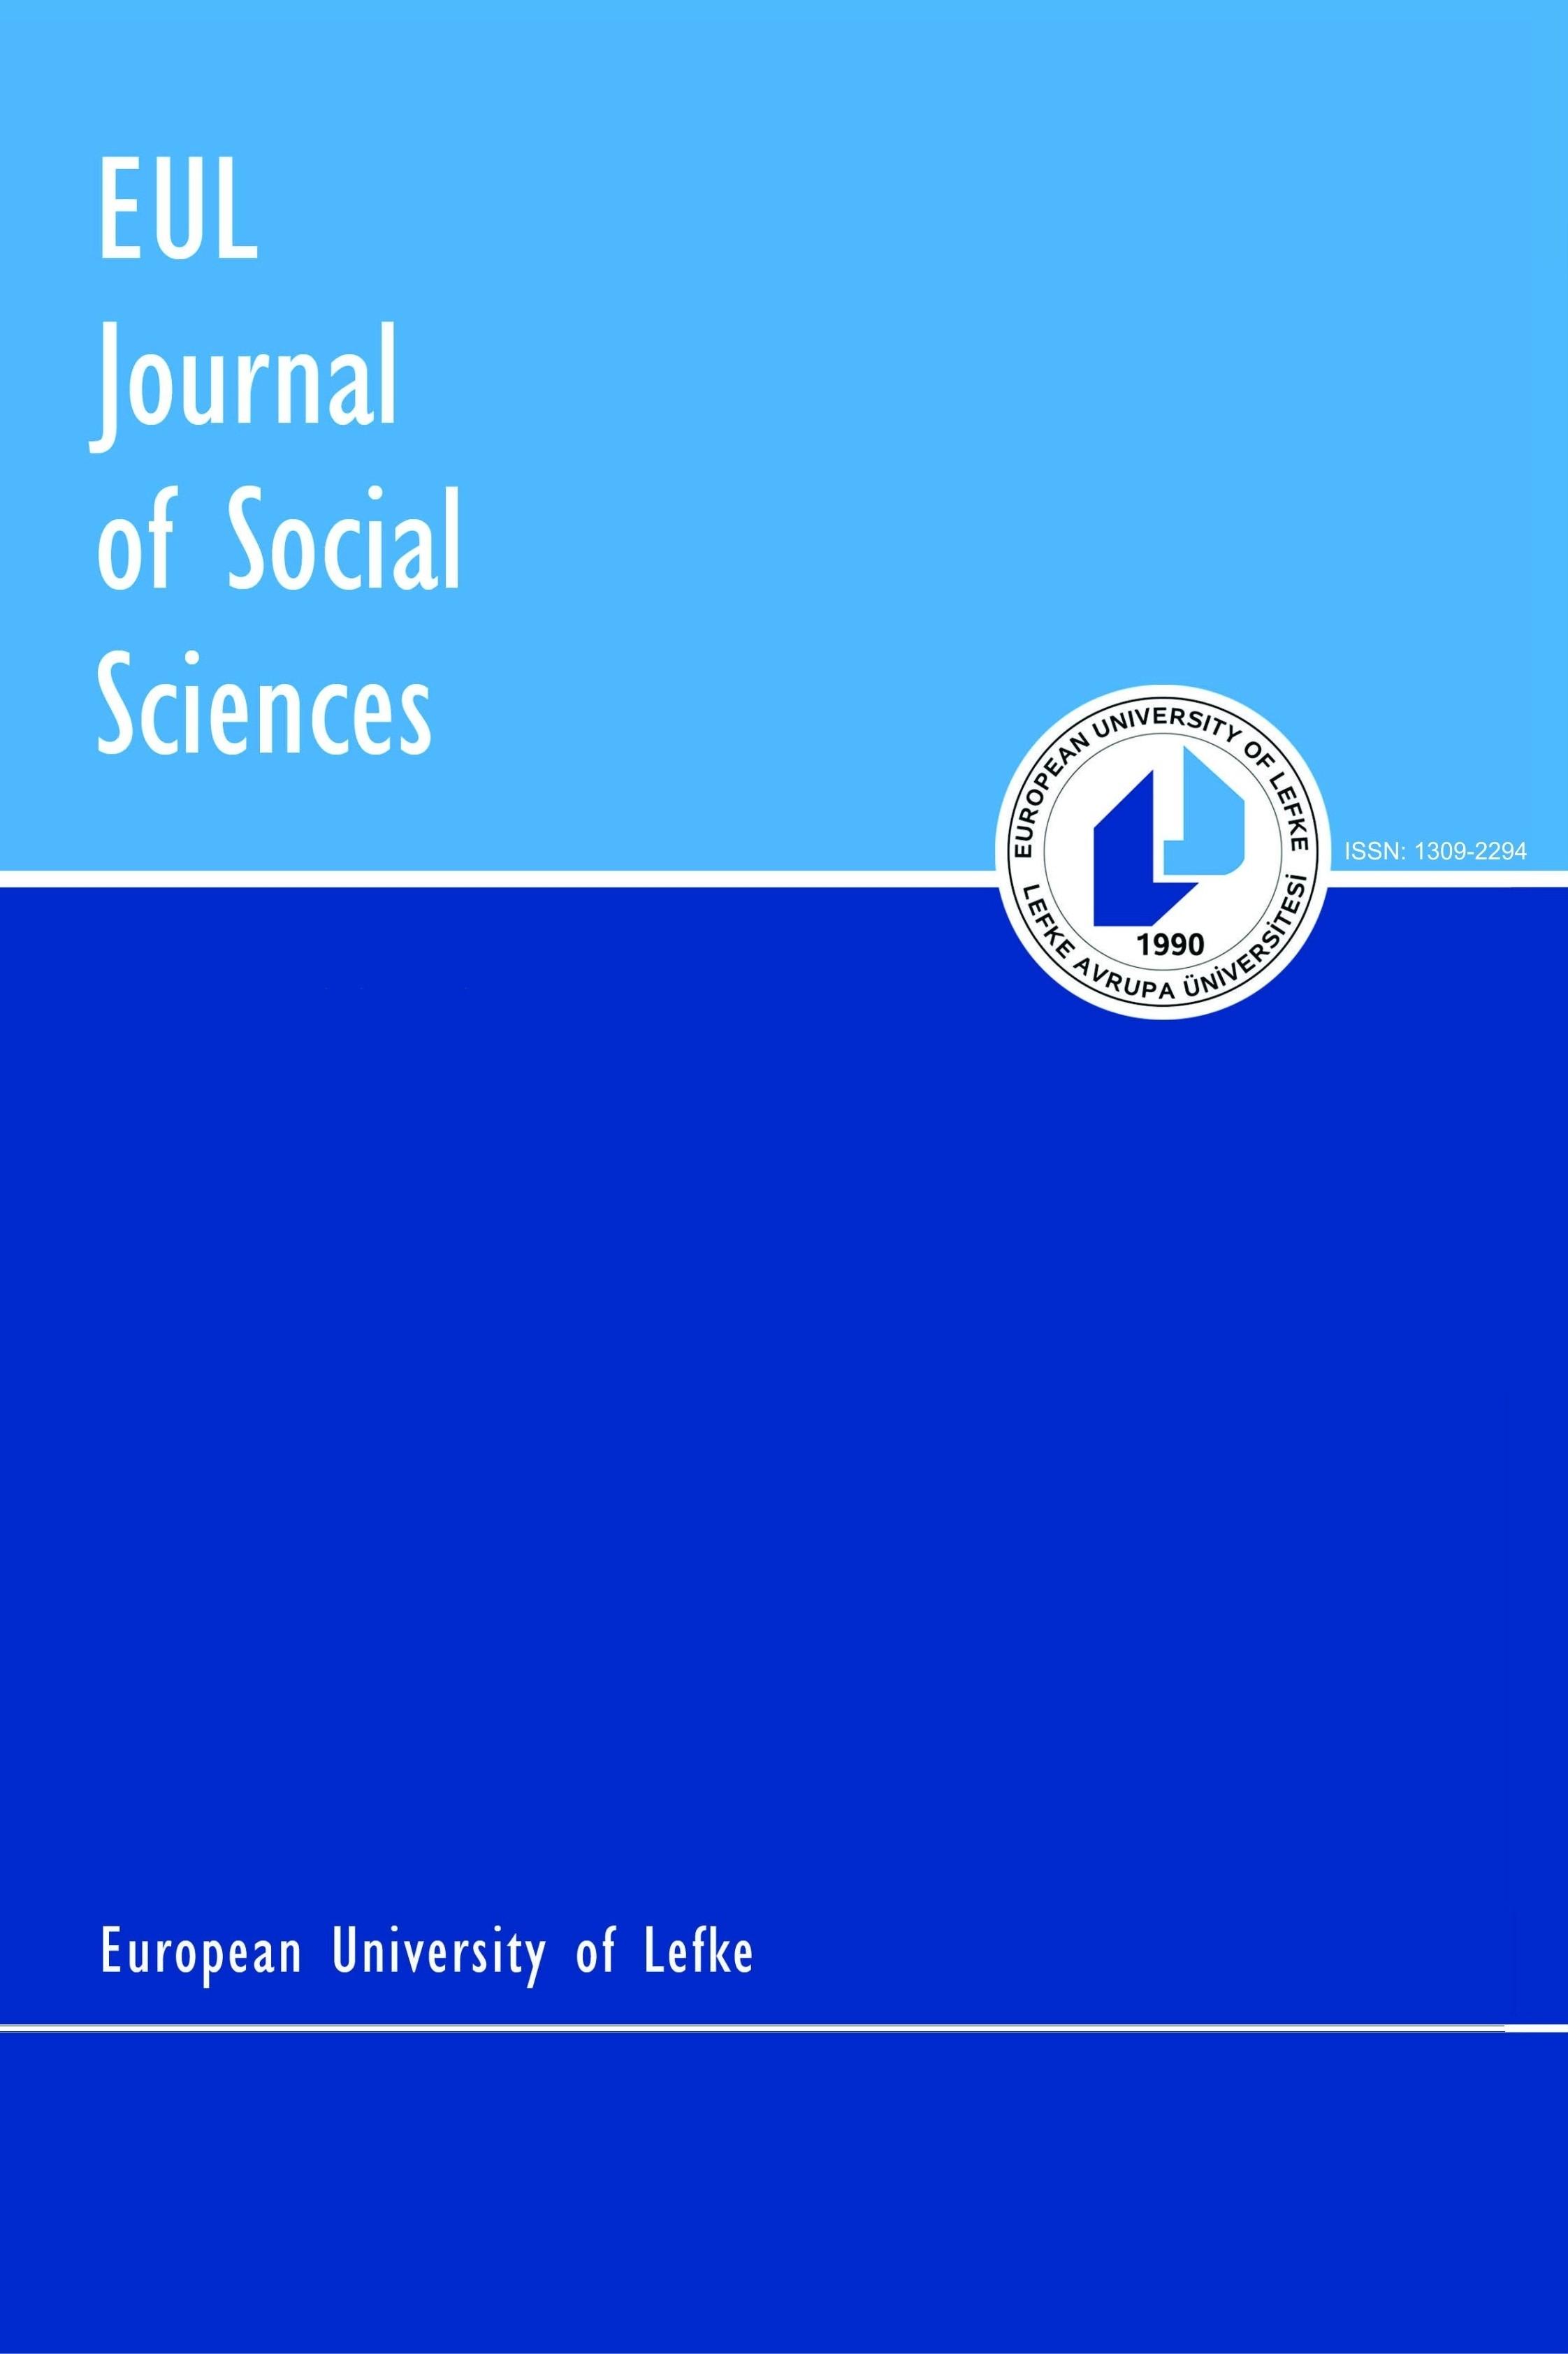 EUL Journal of Social Sciences